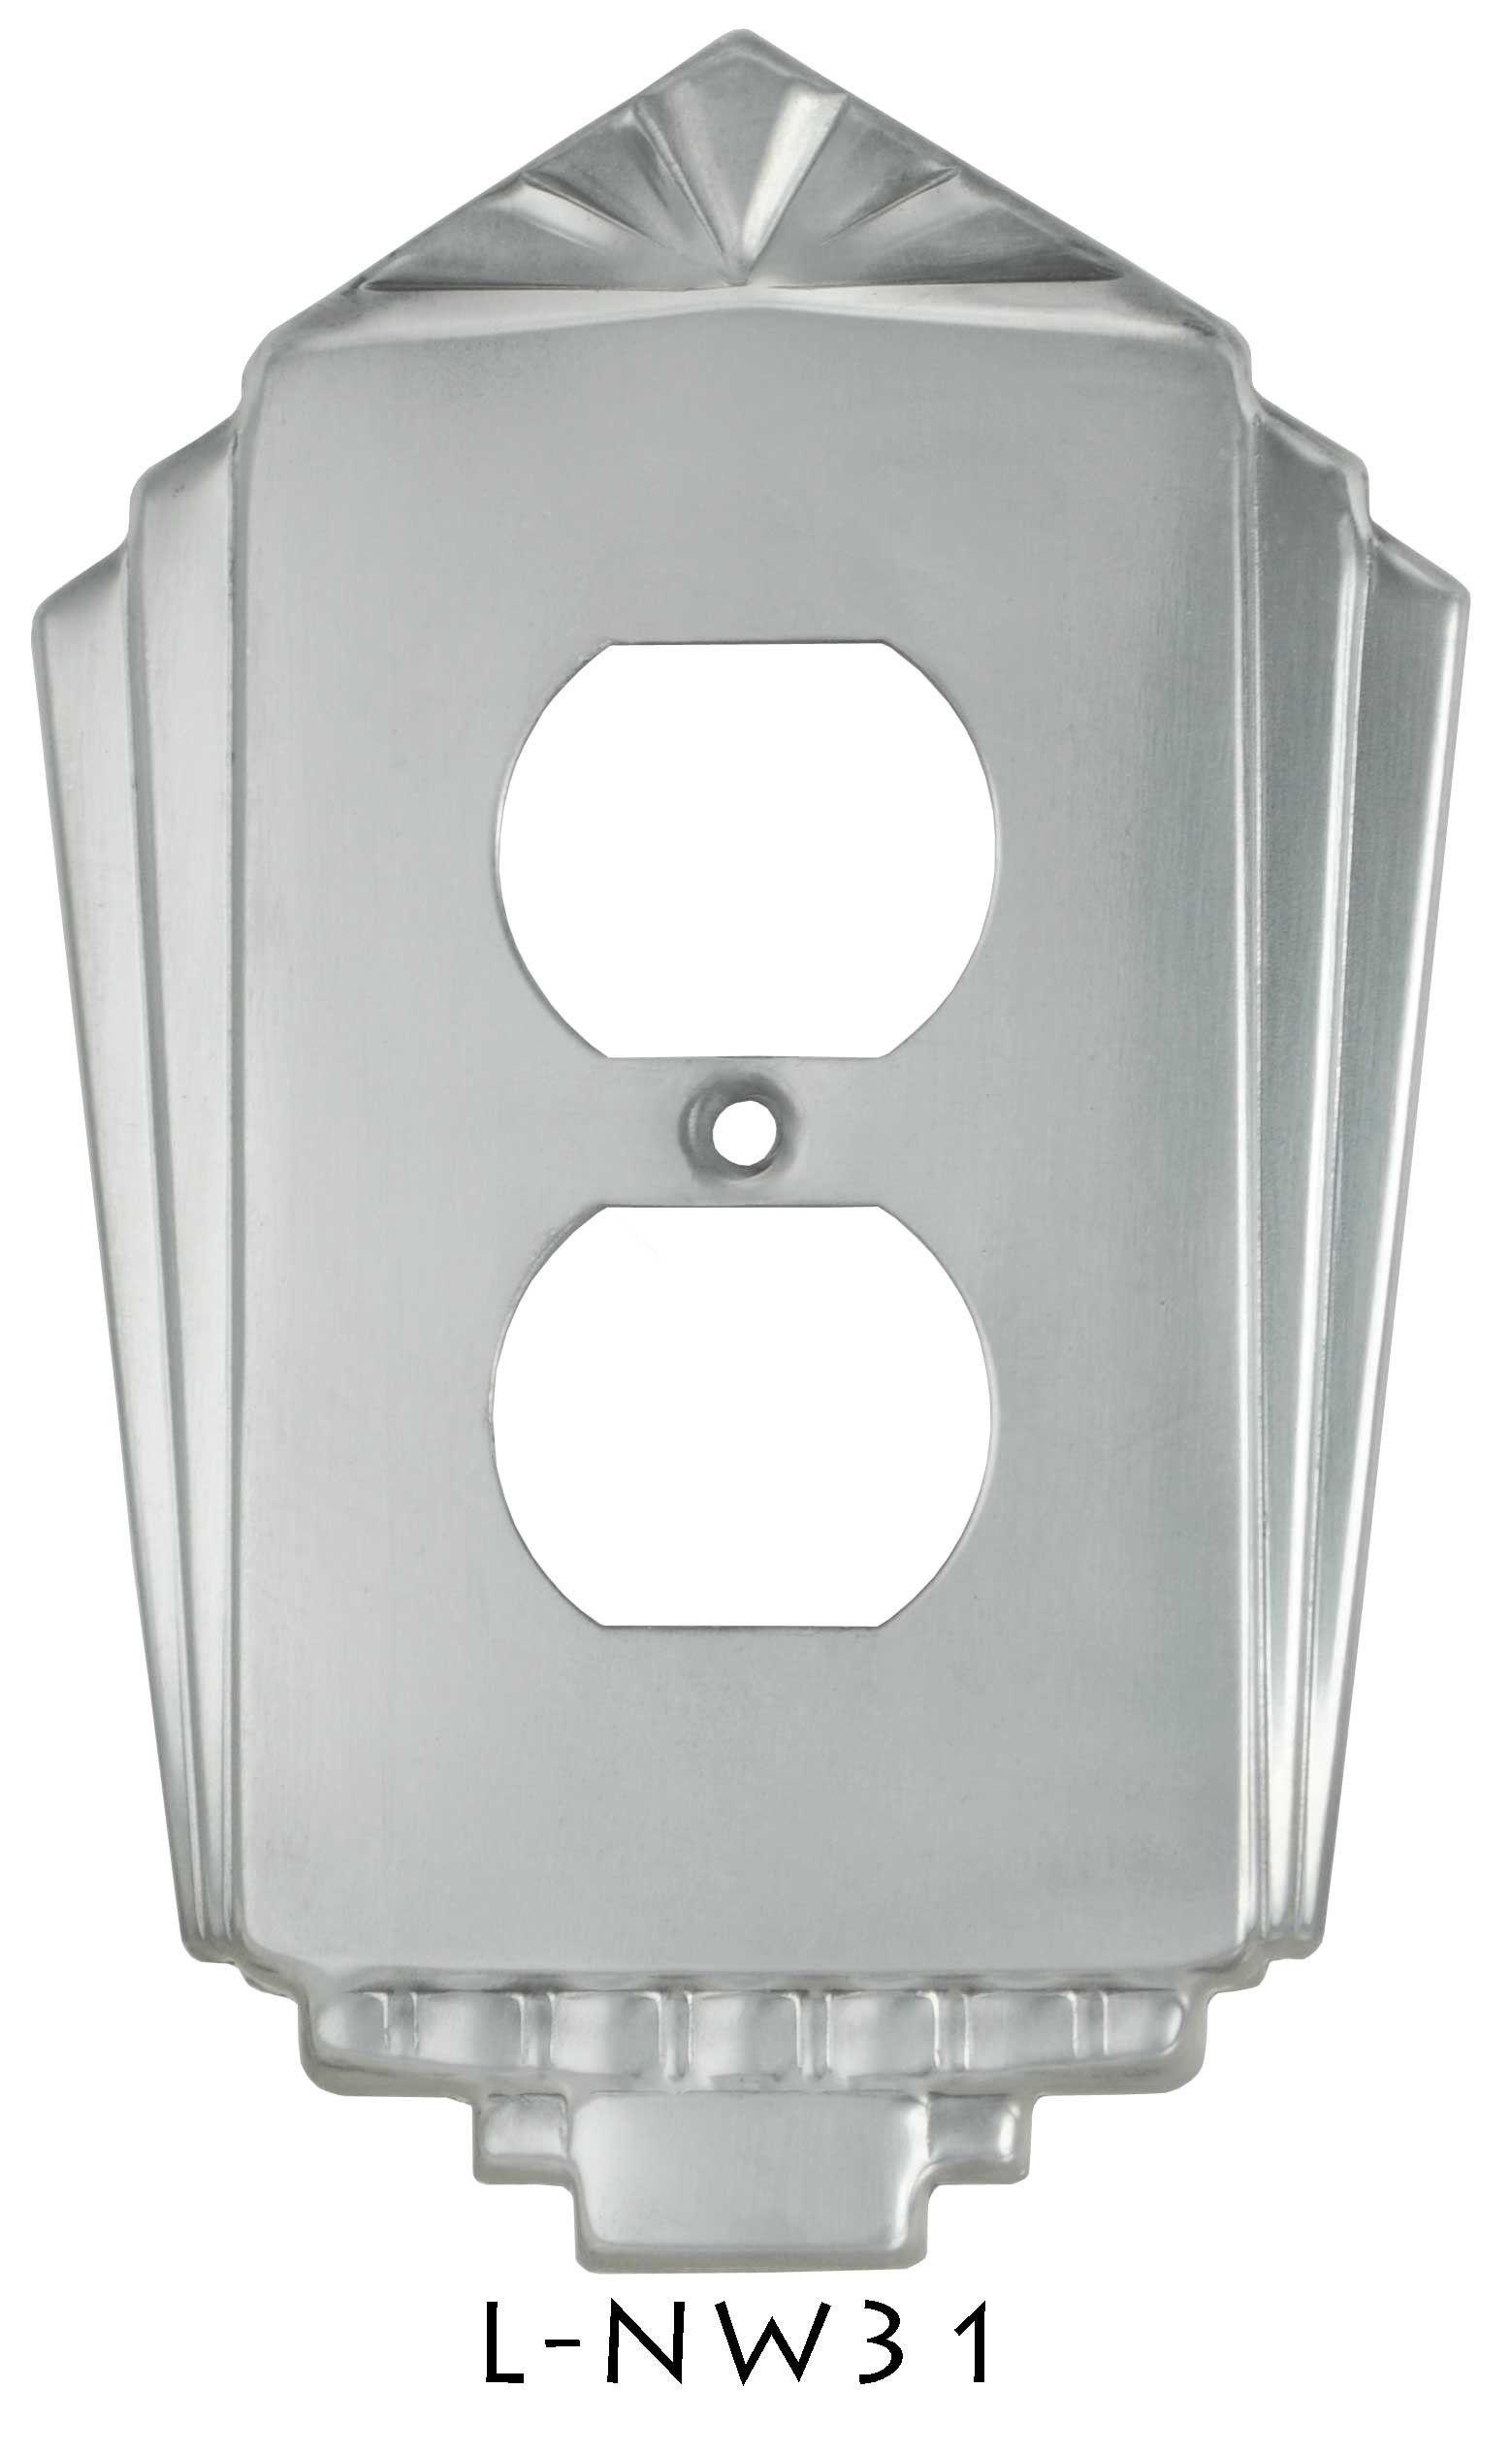 Art-Deco-Style-Plug-Outlet-Cover-(L-W31)